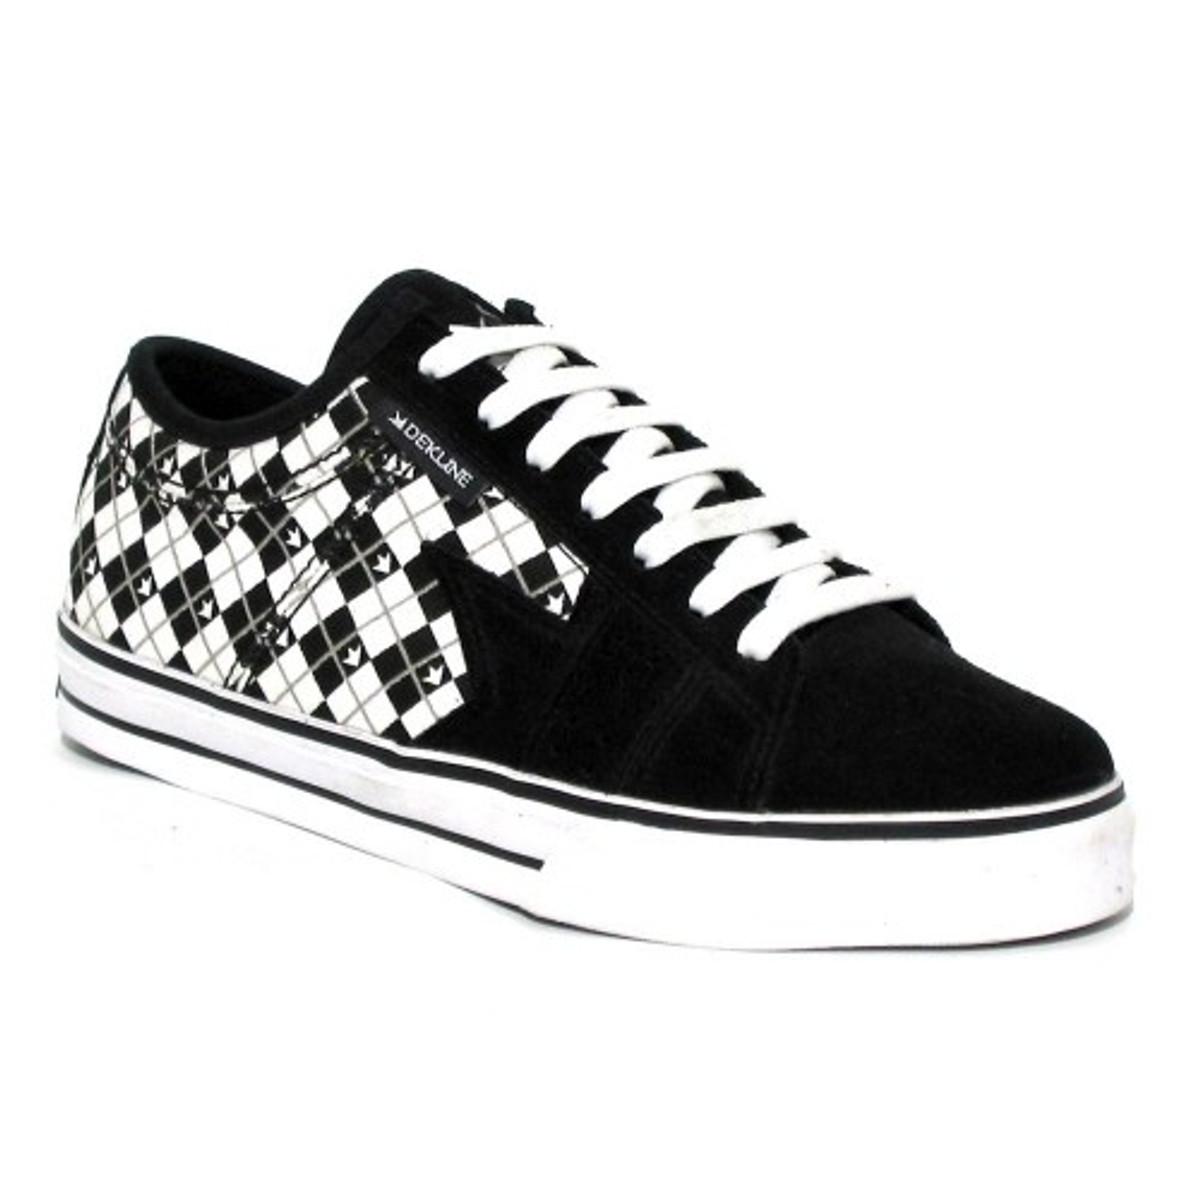 Dekline Skateboard Schuhe Villain Weiß schwarz